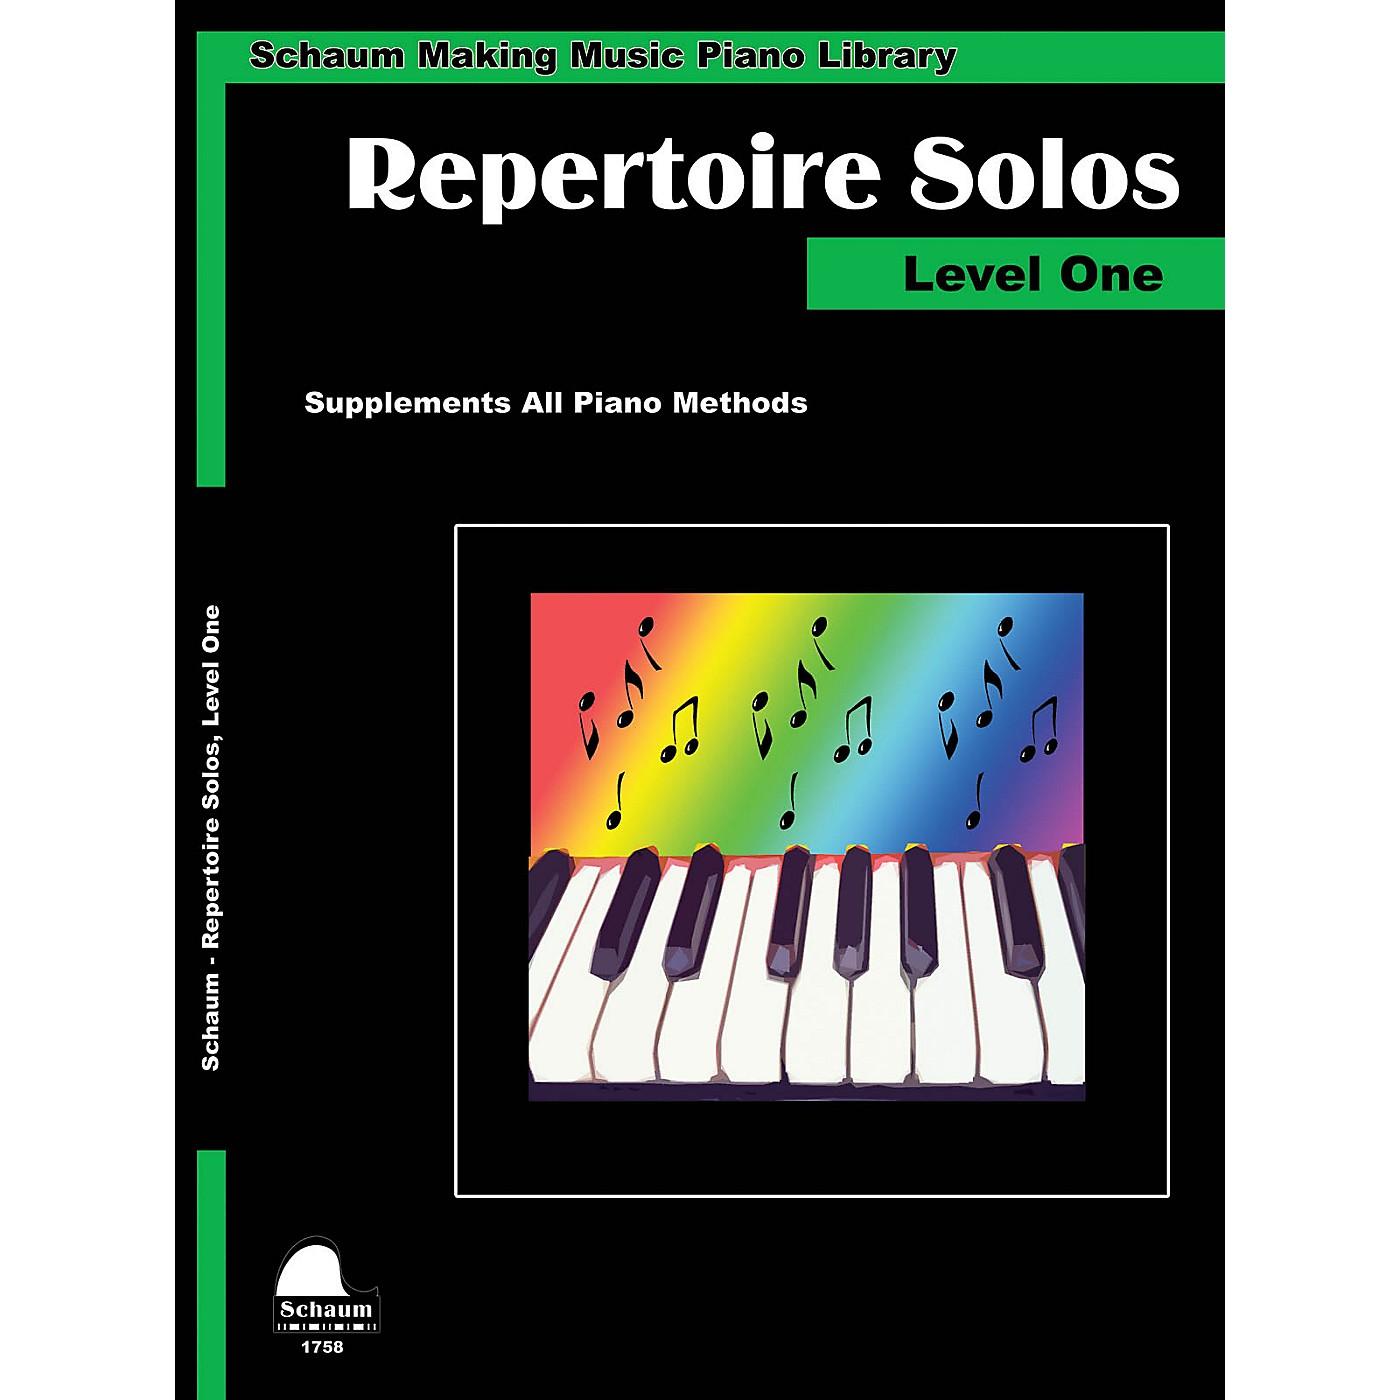 SCHAUM Repertoire Solos Level 1 Educational Piano Book by Wesley Schaum (Level Elem) thumbnail